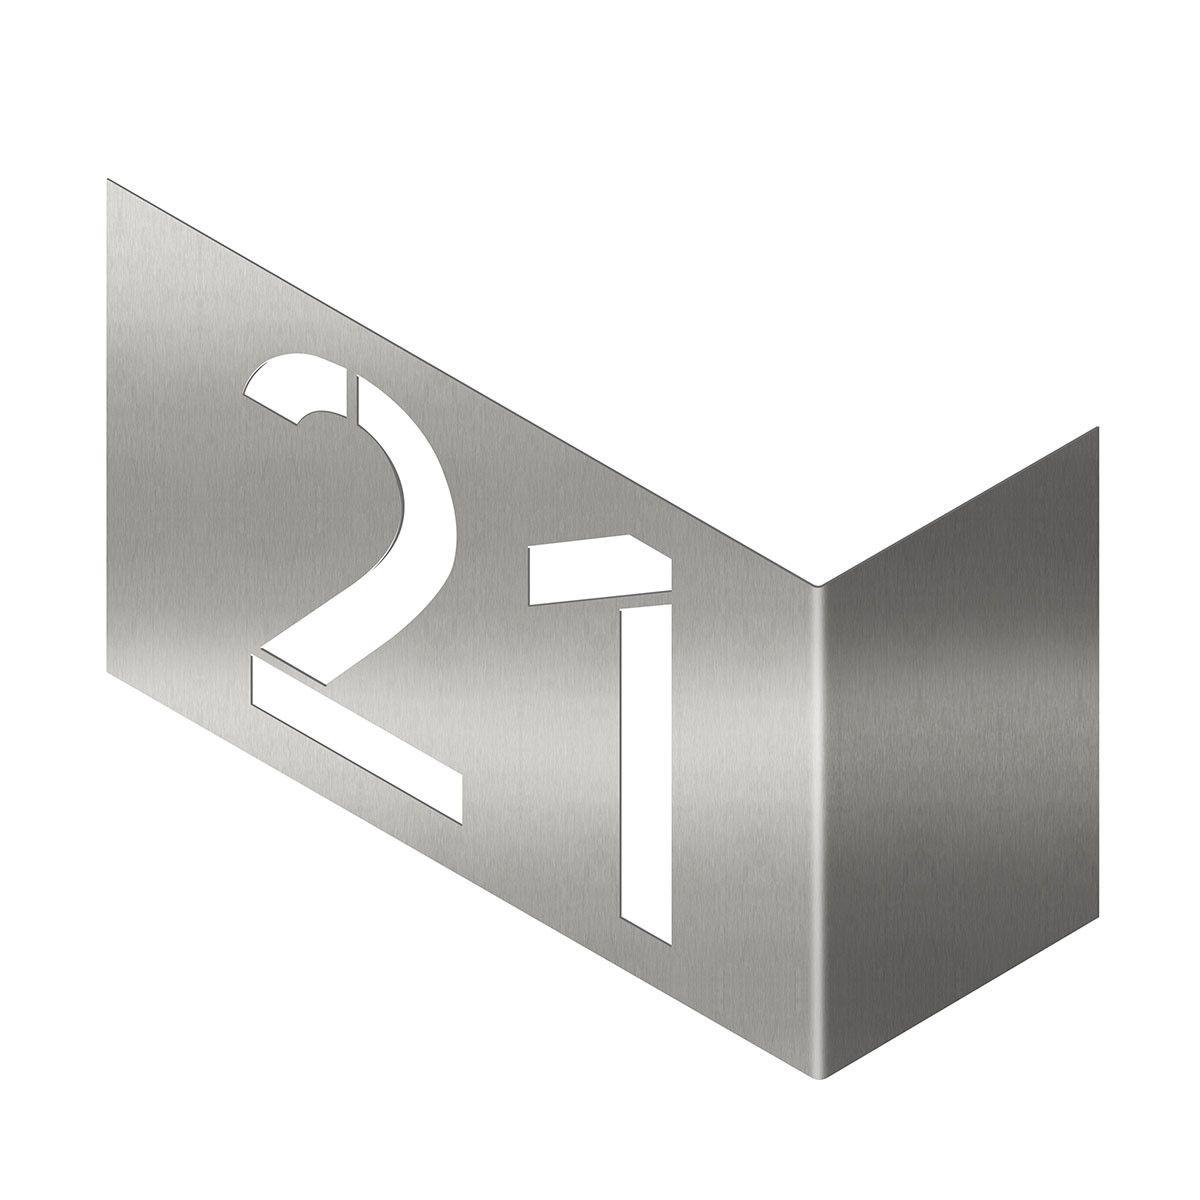 Moderne Hausnummern Edelstahl moderne design hausnummer aus edelstahl v2a zur eckmontage die